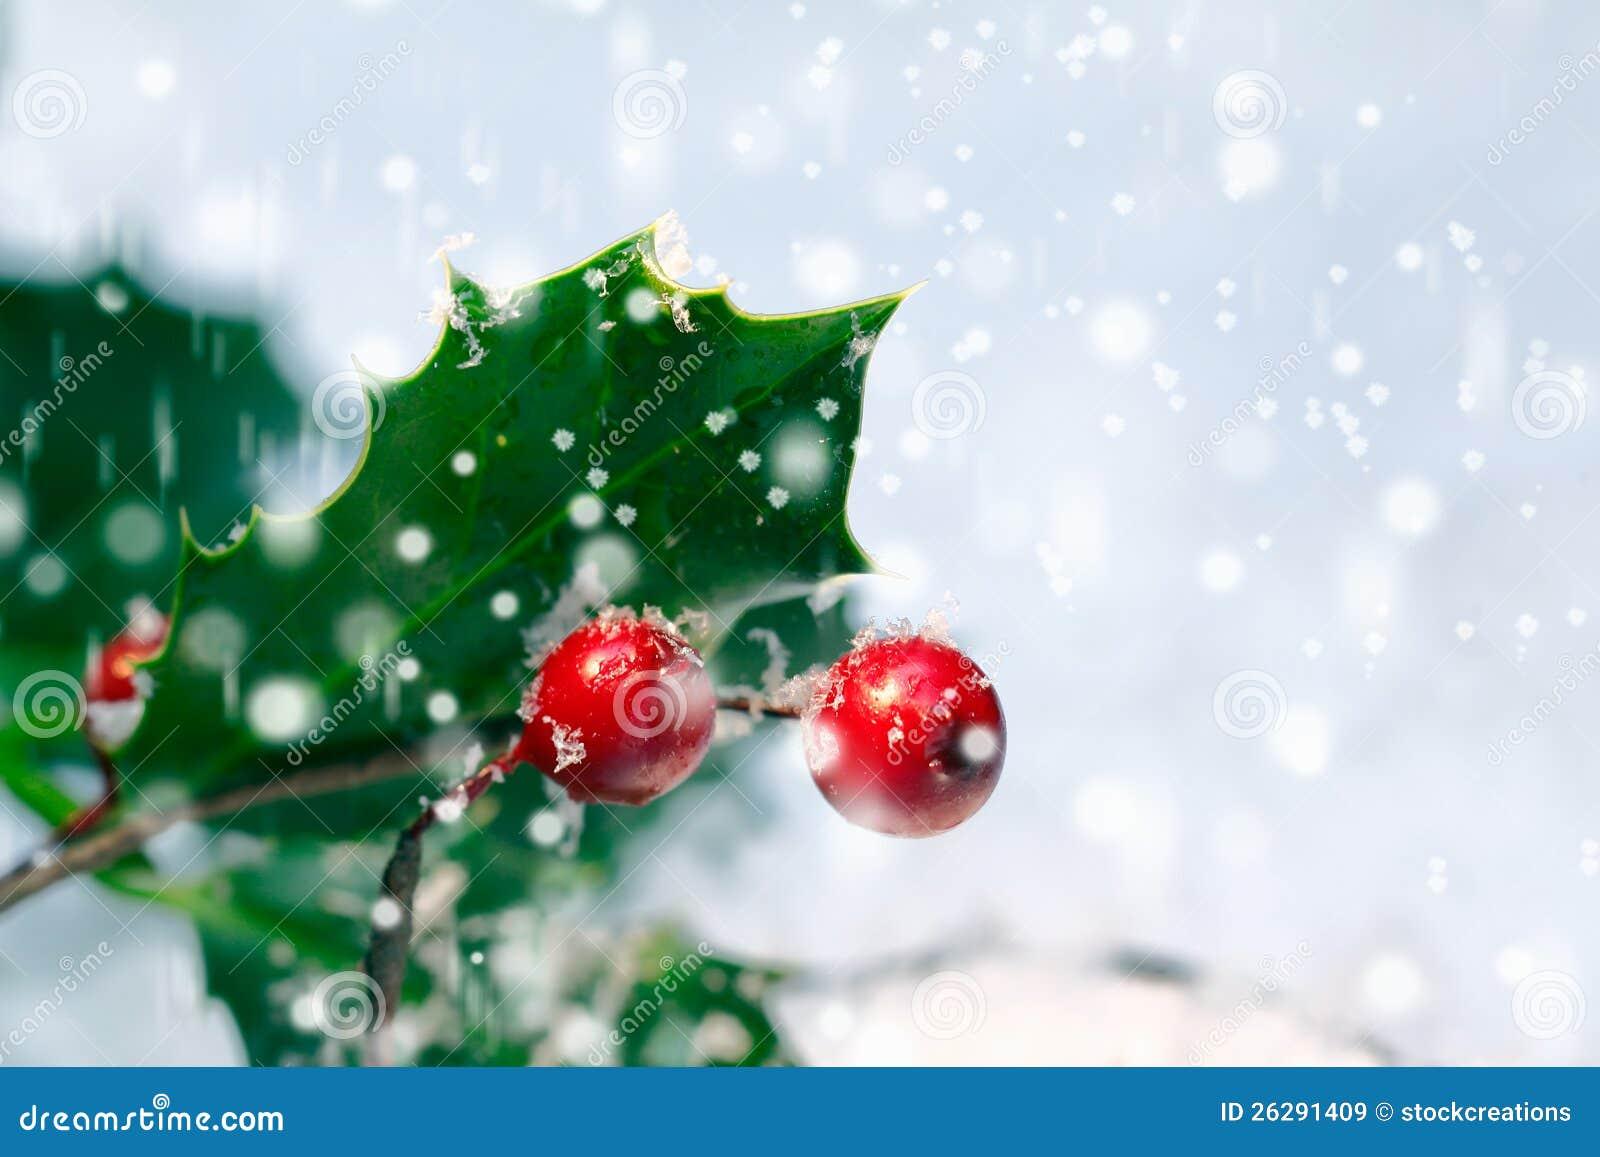 Festive Christmas Holly Background Royalty Free Stock Images - Image ...